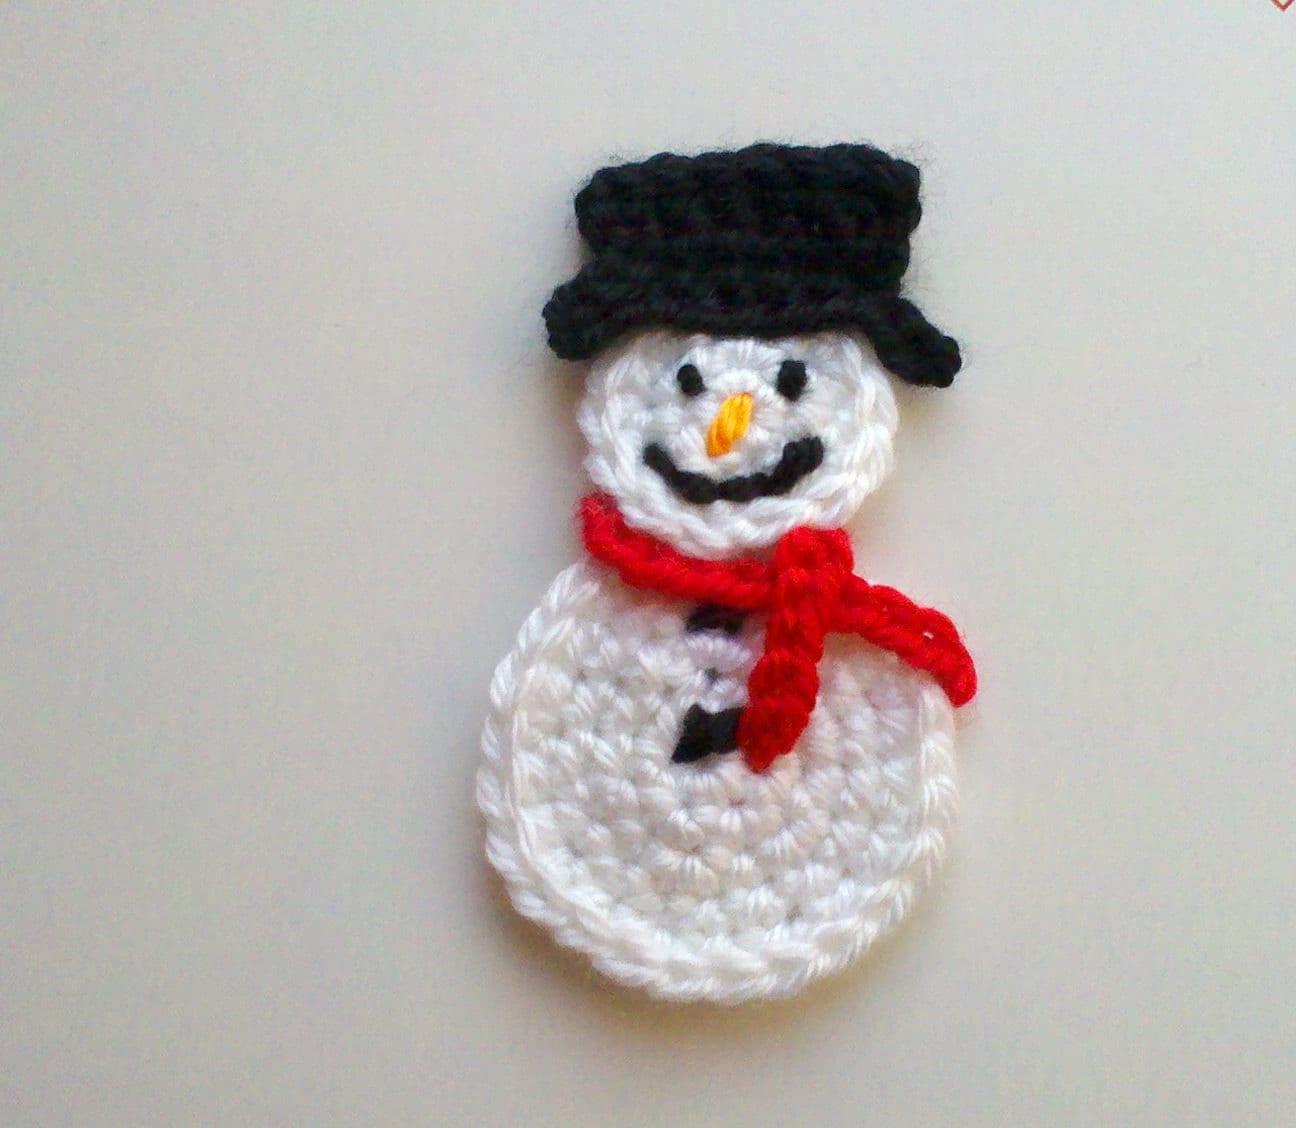 Set of 2 pcs Large handmade crochet snowman appliques 4inch